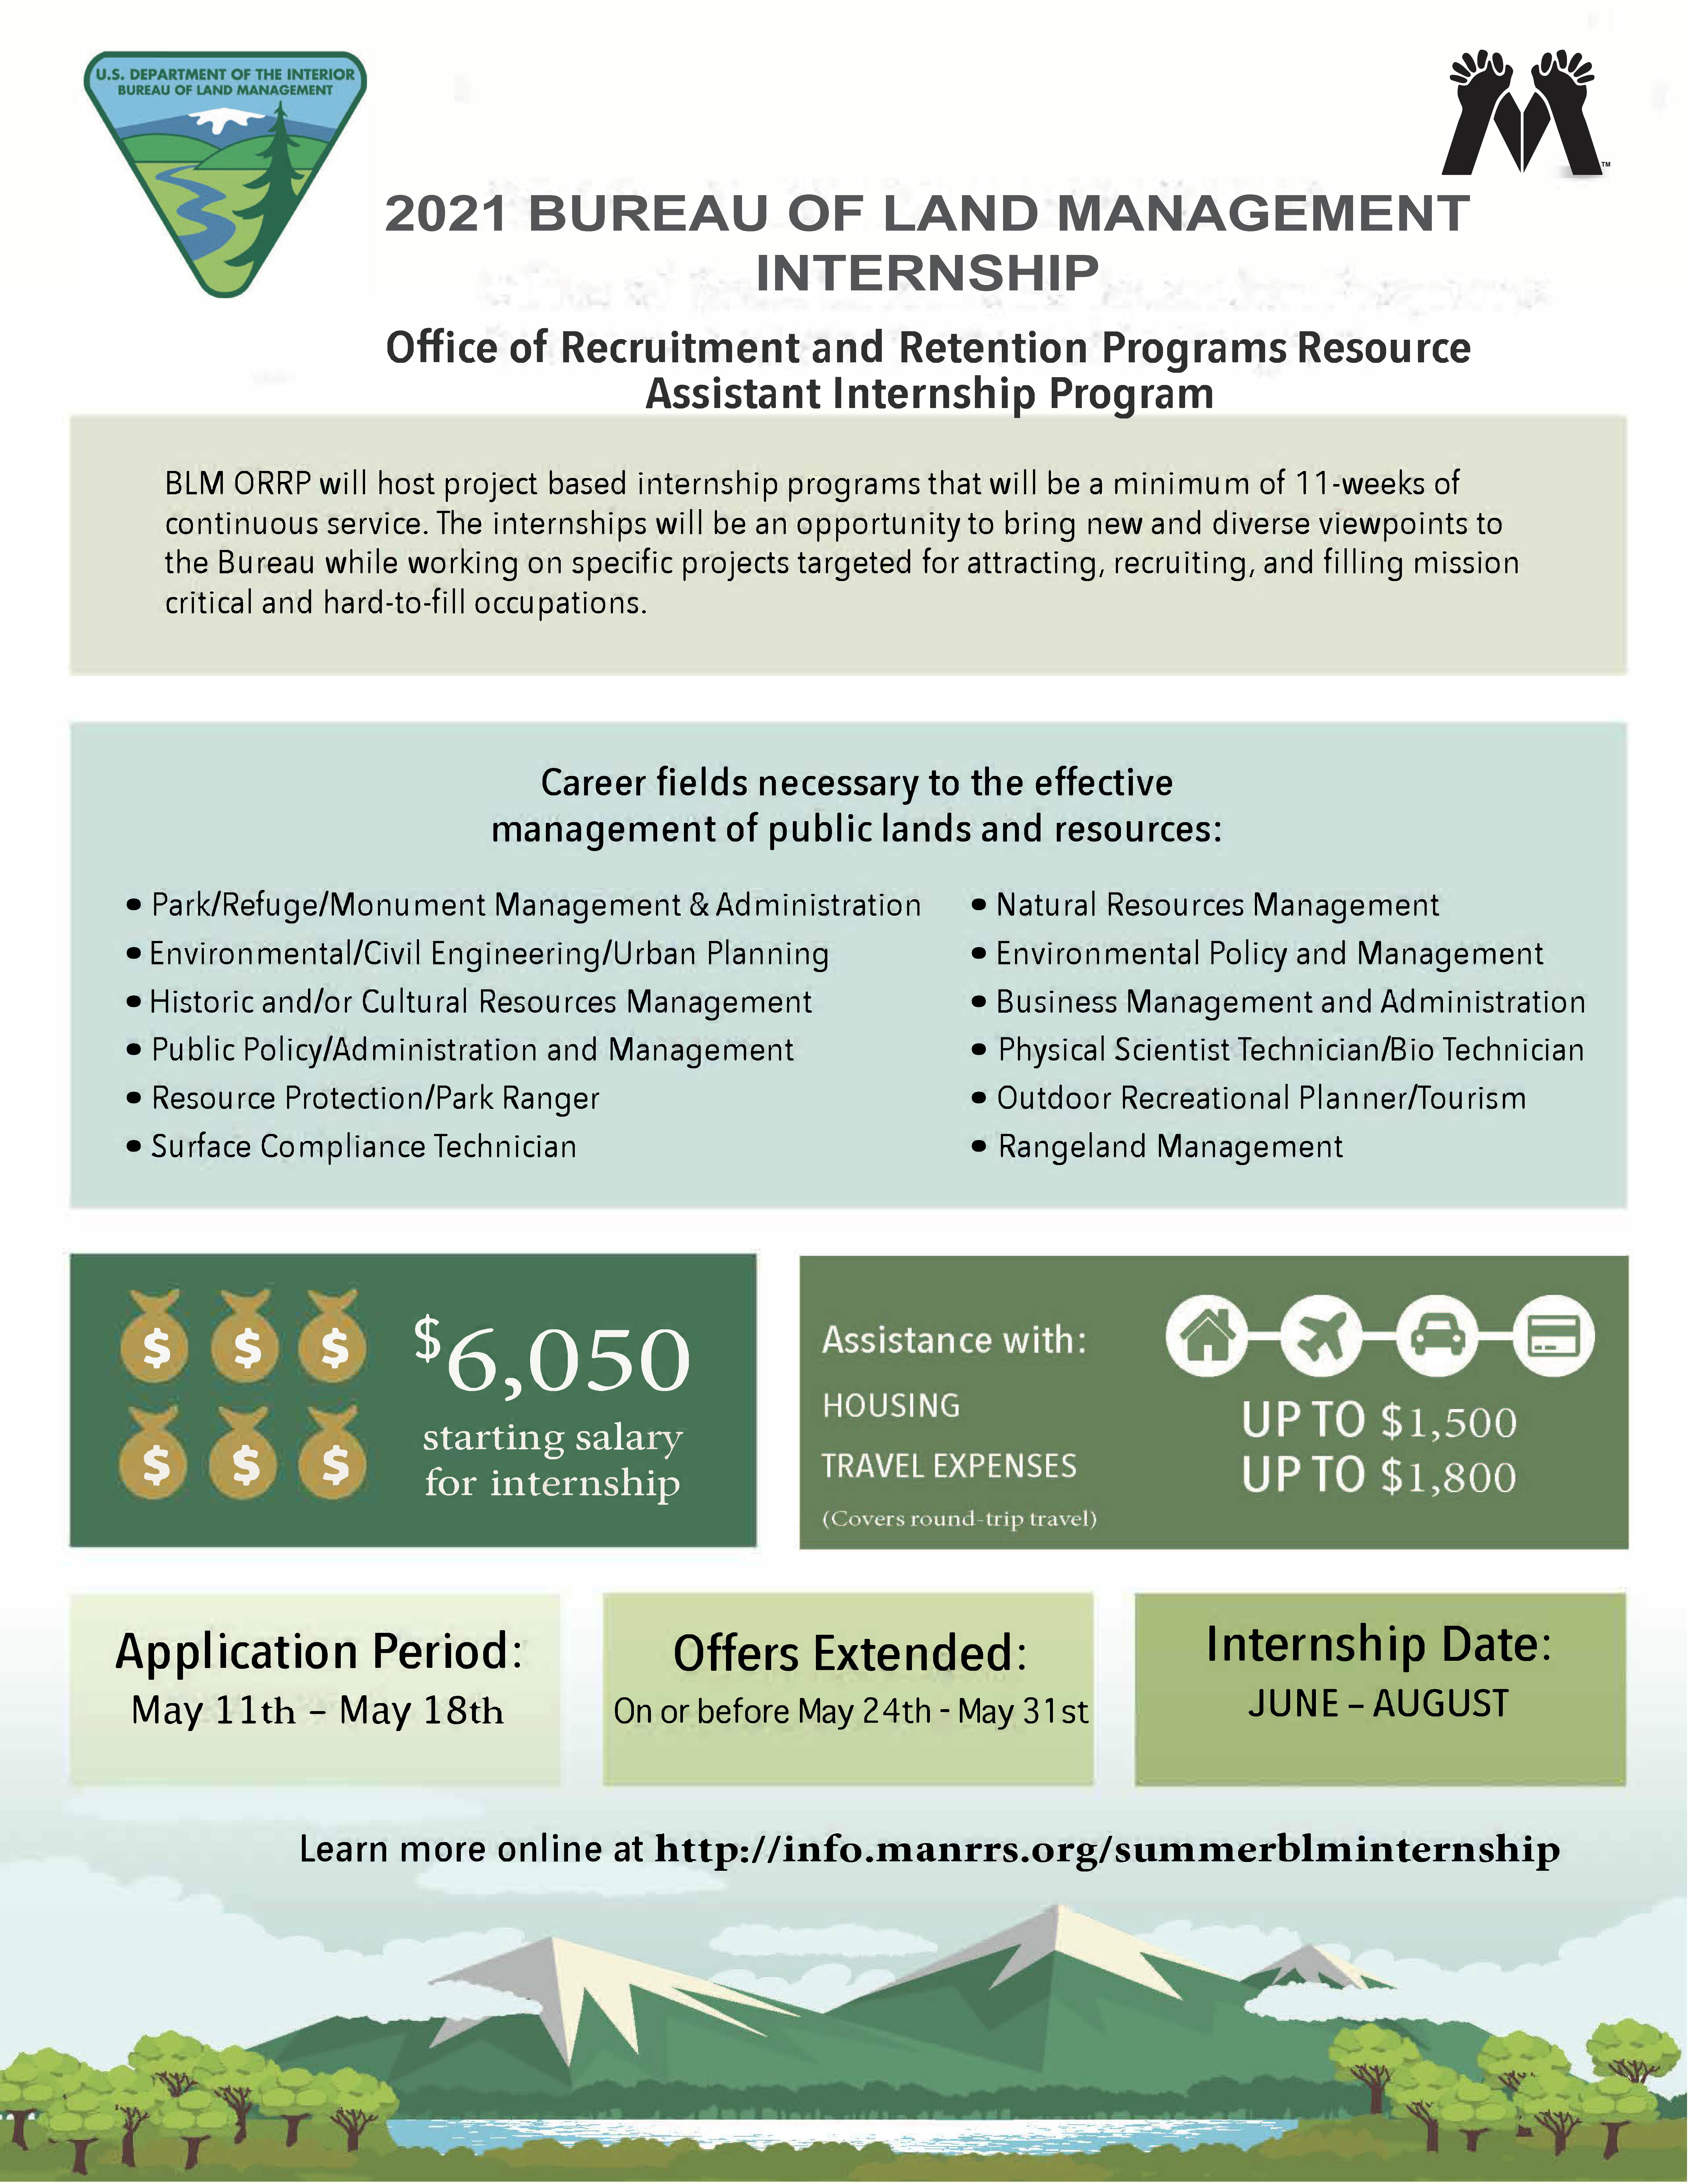 BLM 2021 Internship